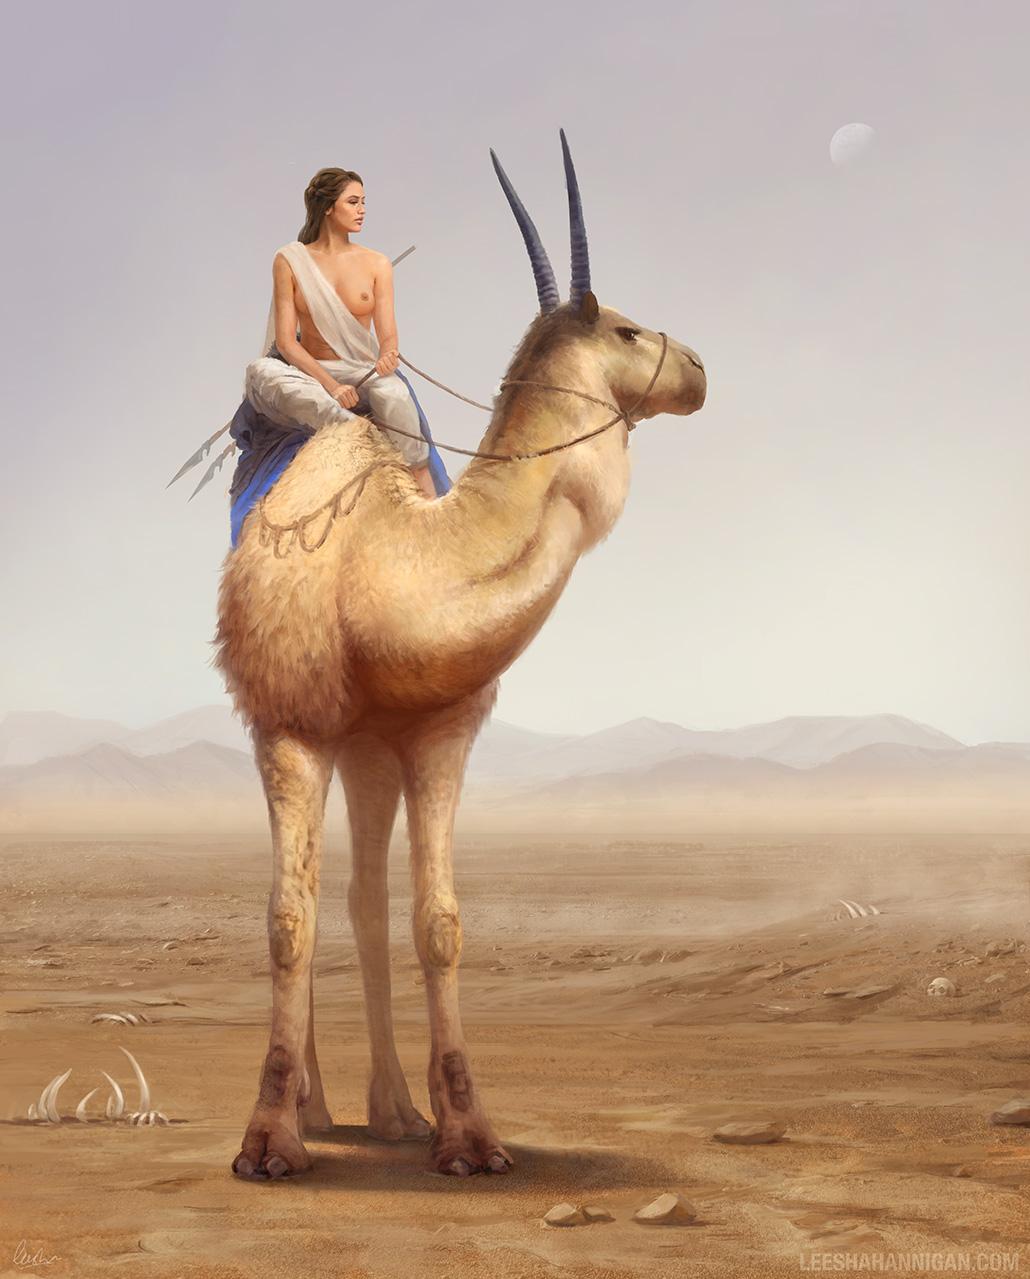 Leesha-Hannigan-Drifting-Echoes-In-The-Desert-Of-Unrest